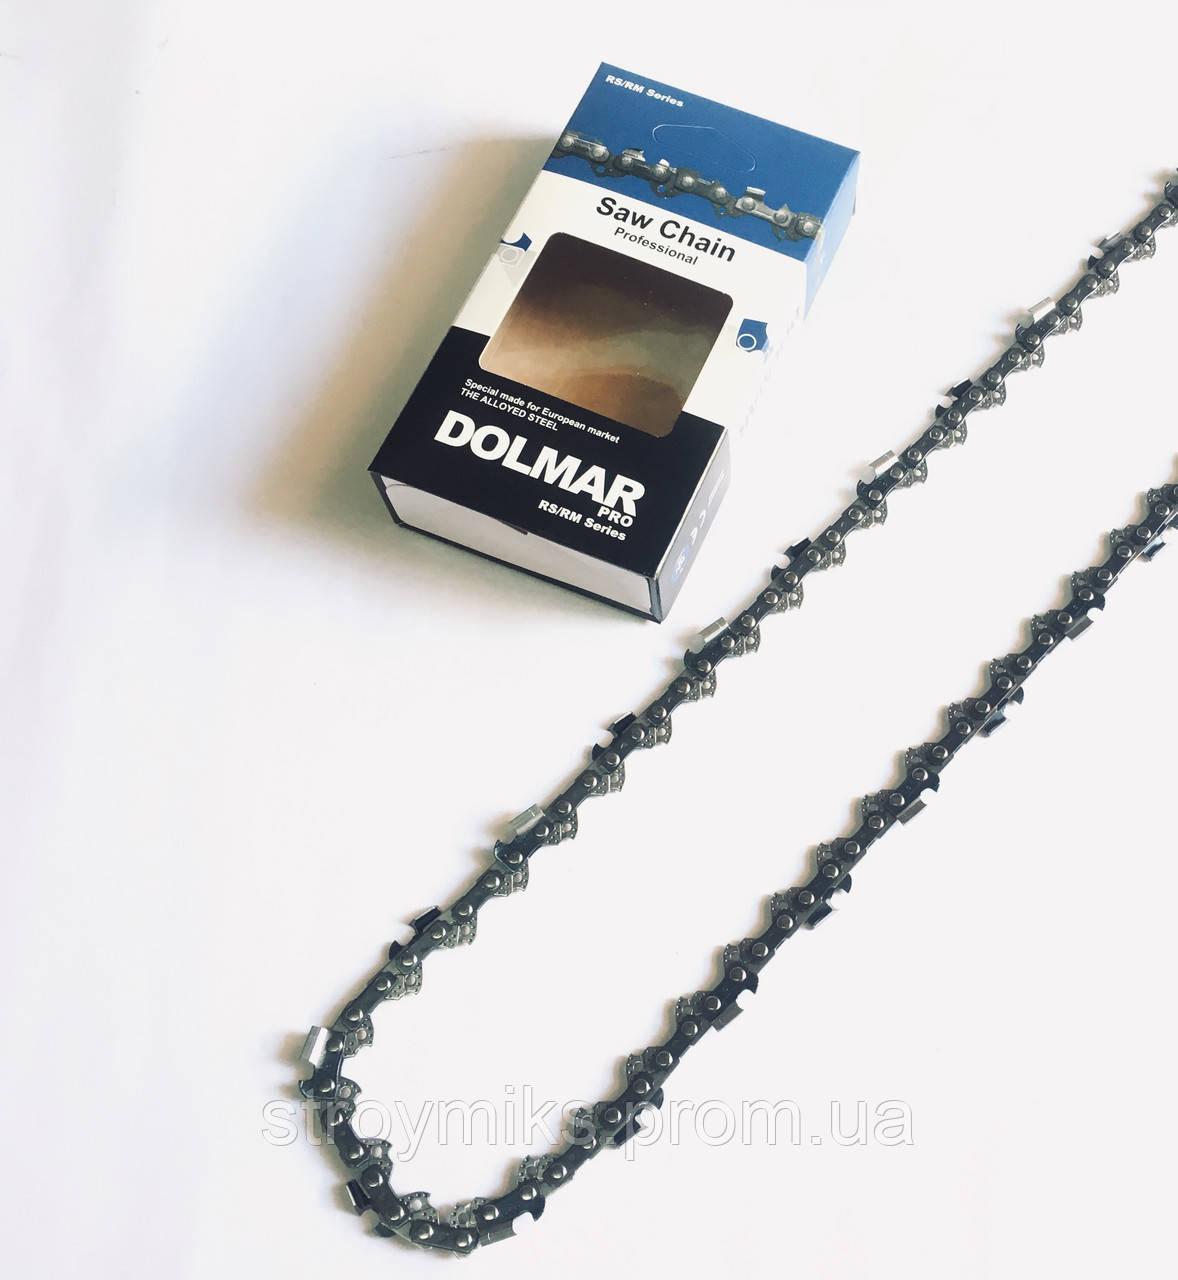 Цепь Dolmar Super 50 звеньев, 1,3 мм